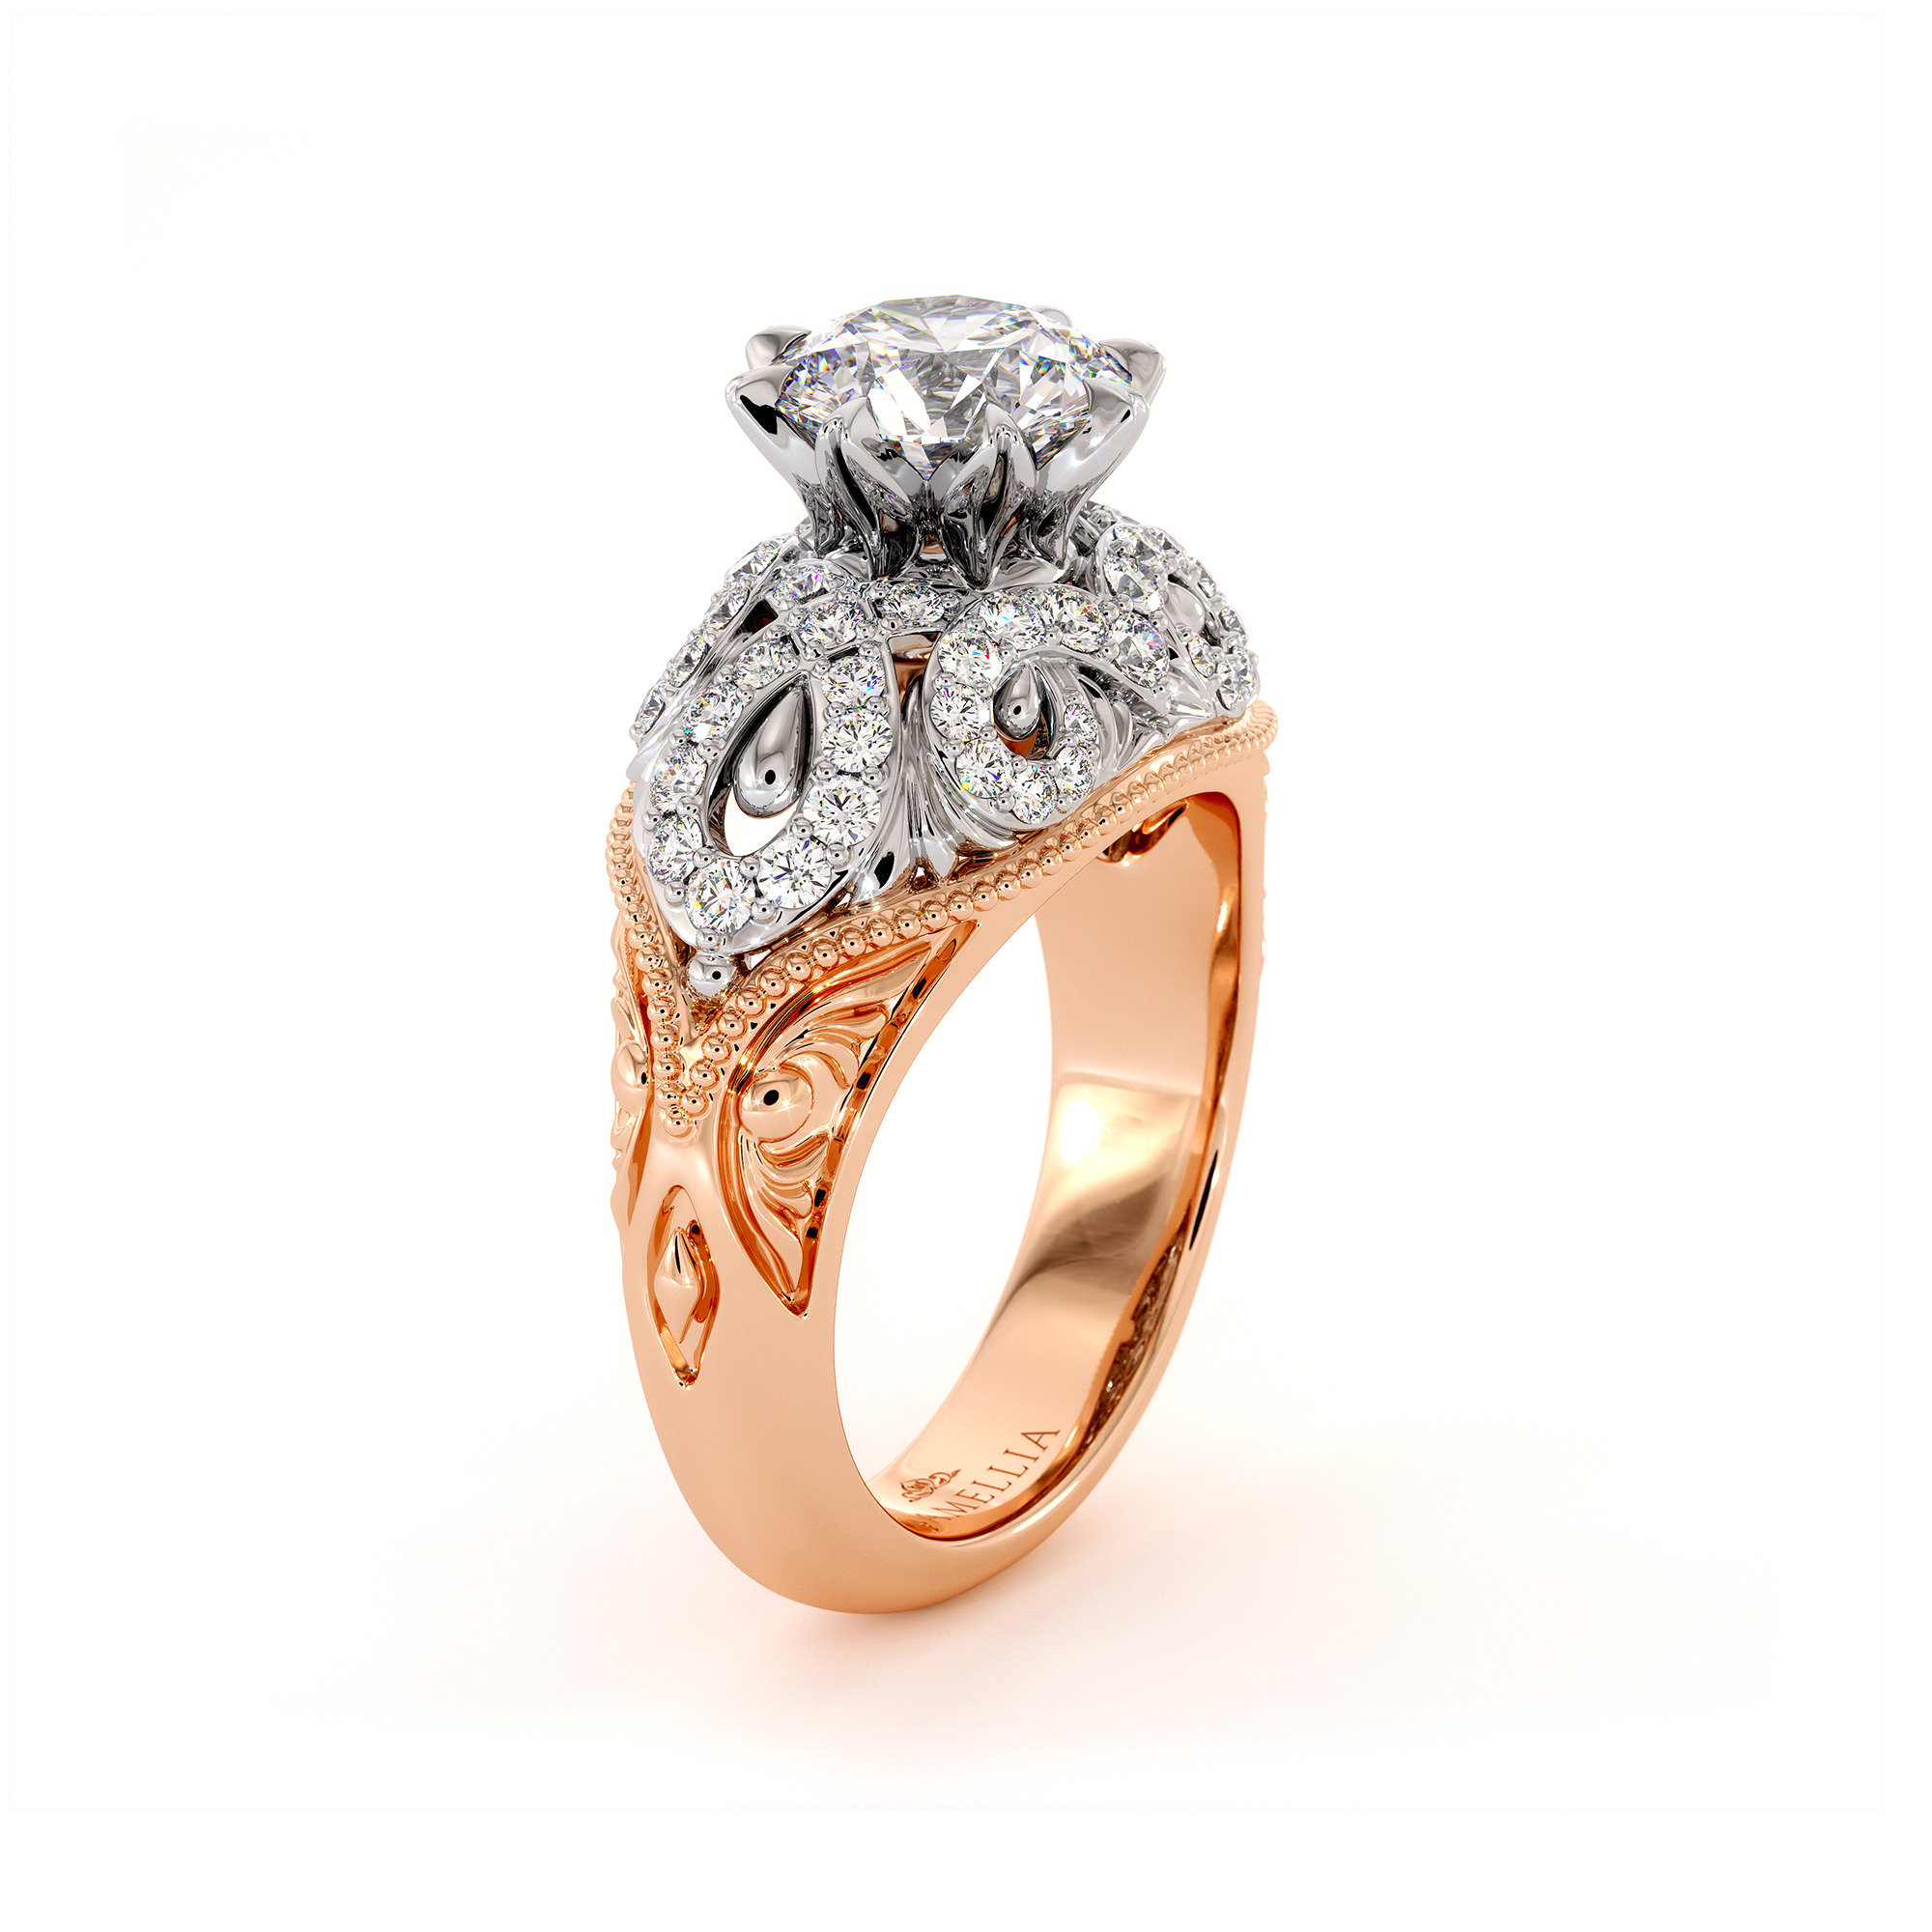 Plenty 2 Tone Gold Engagement Ring Milgrain Gold Drops Ring 1.55 Ct. Round Moissanite Ring Regal Diamonds Engagement Ring